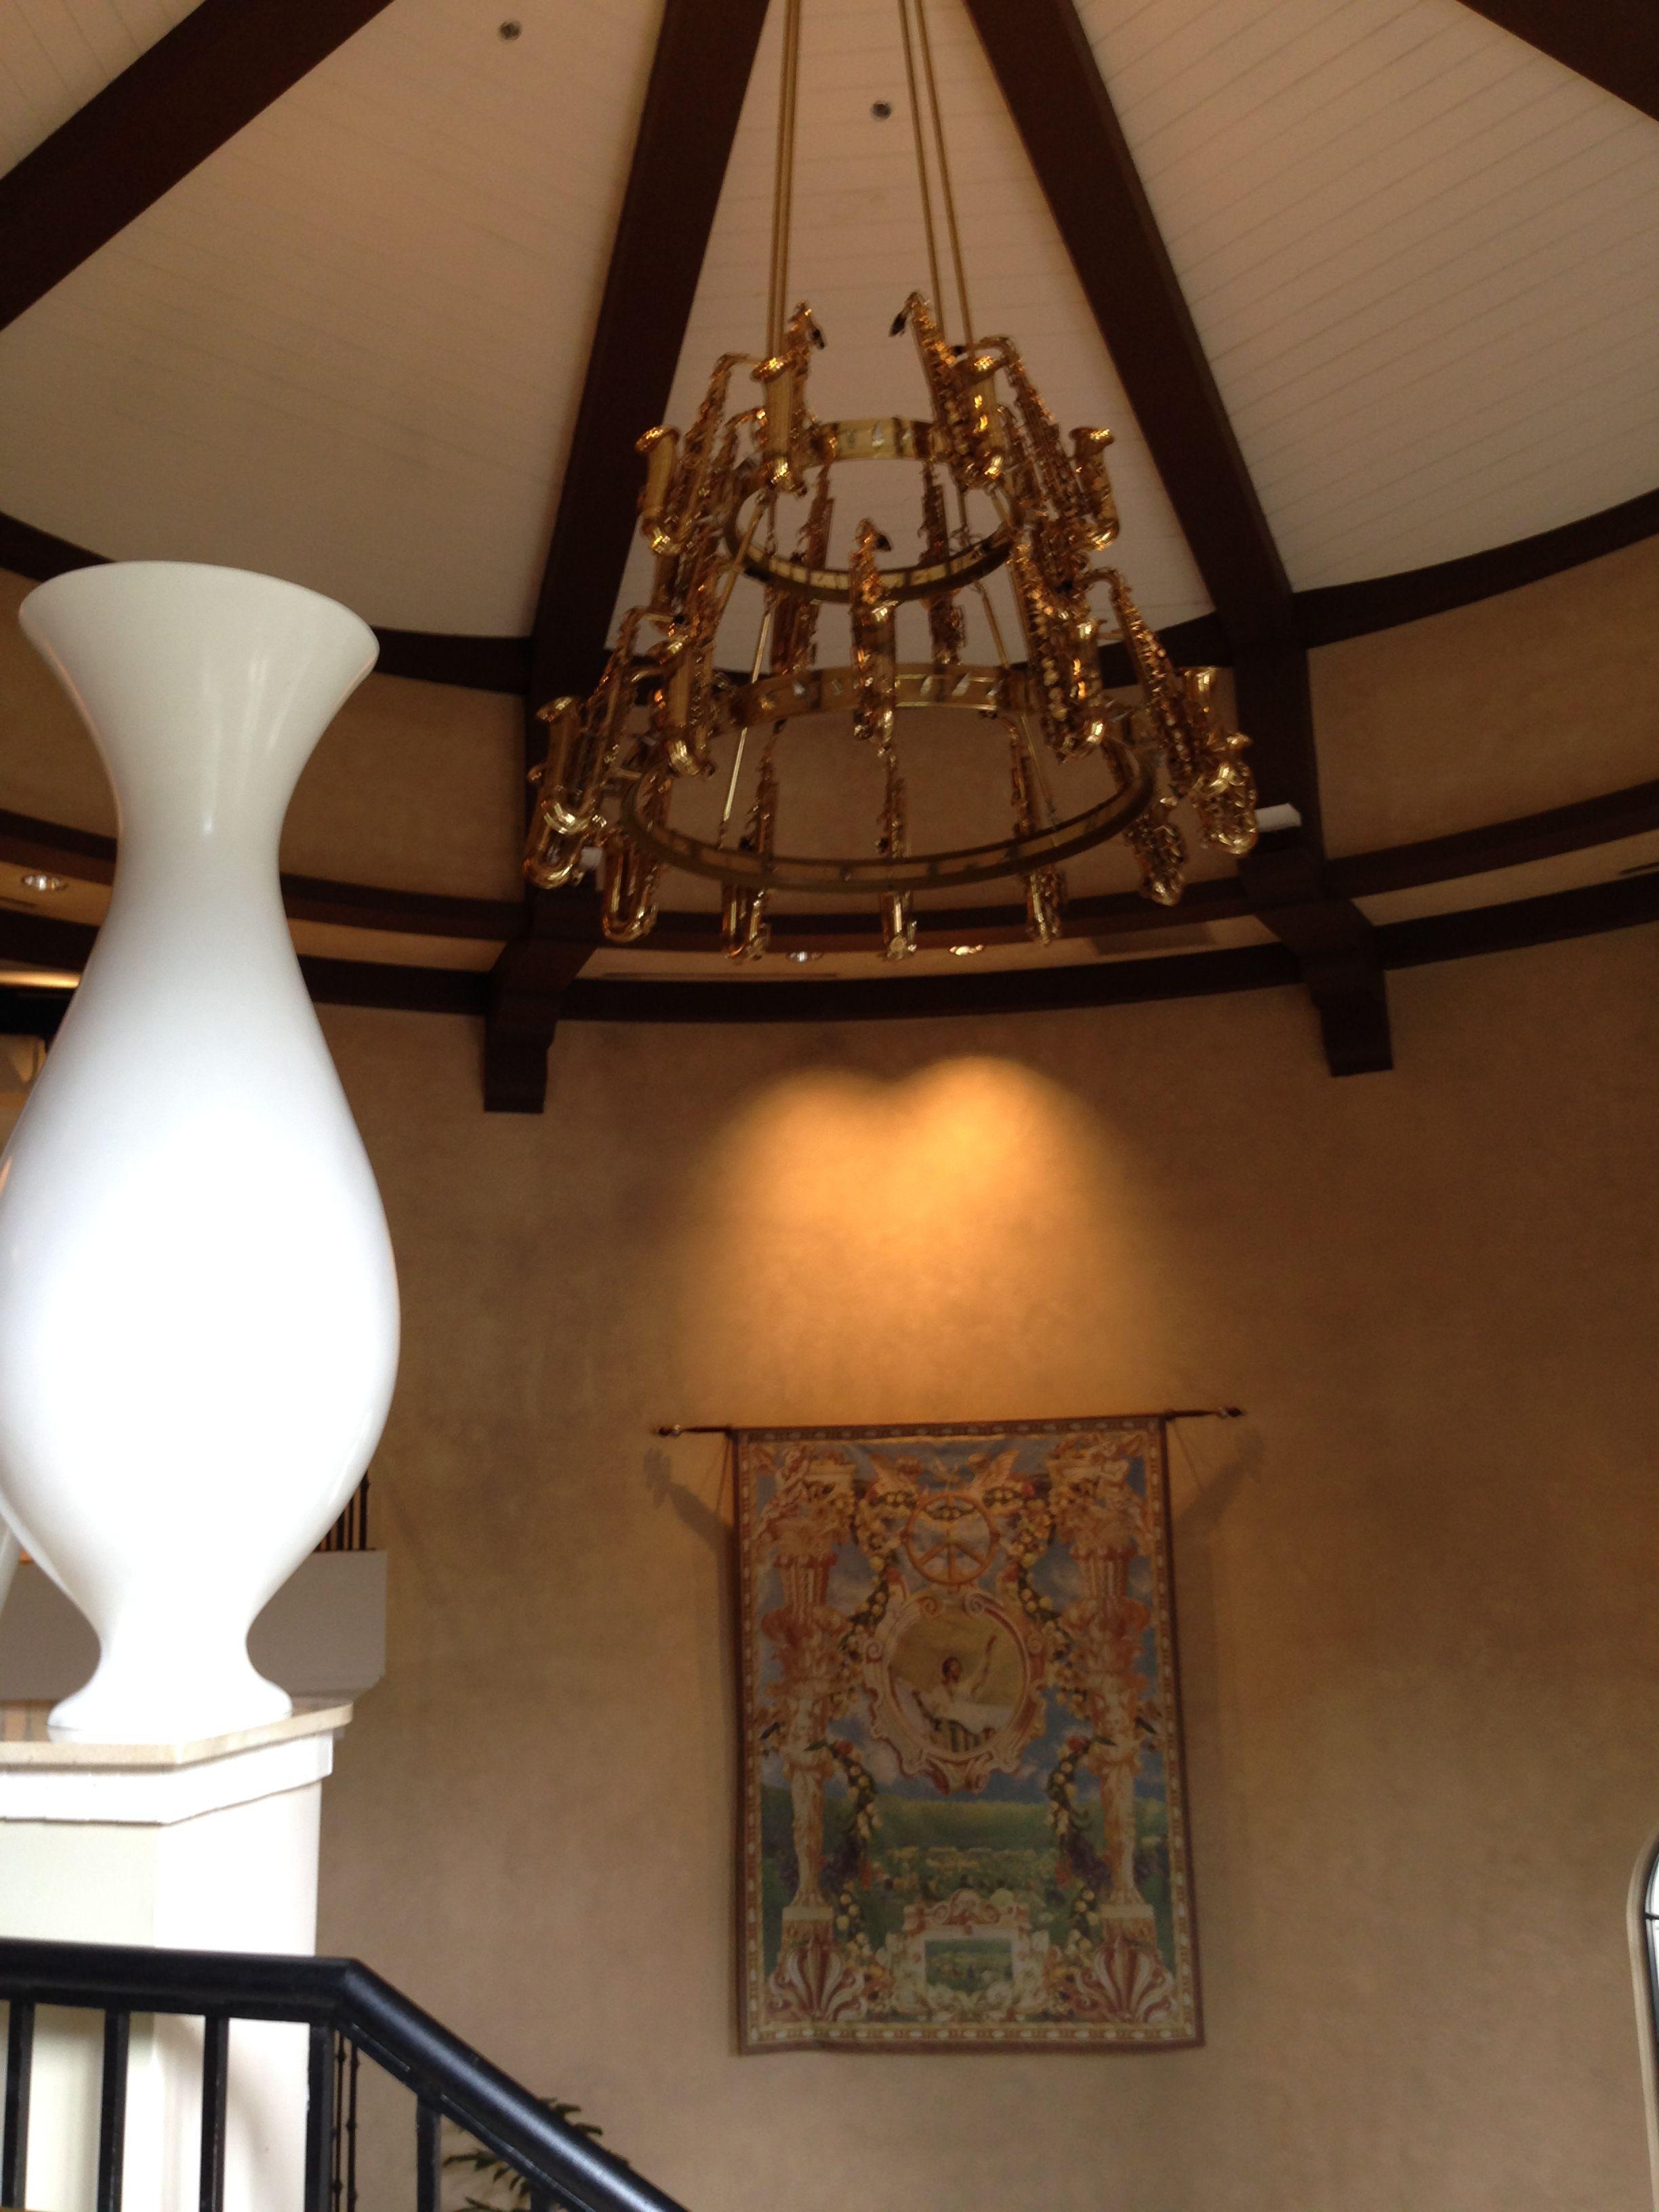 Saxophone chandelier at hard rock hotel orlando fl usa